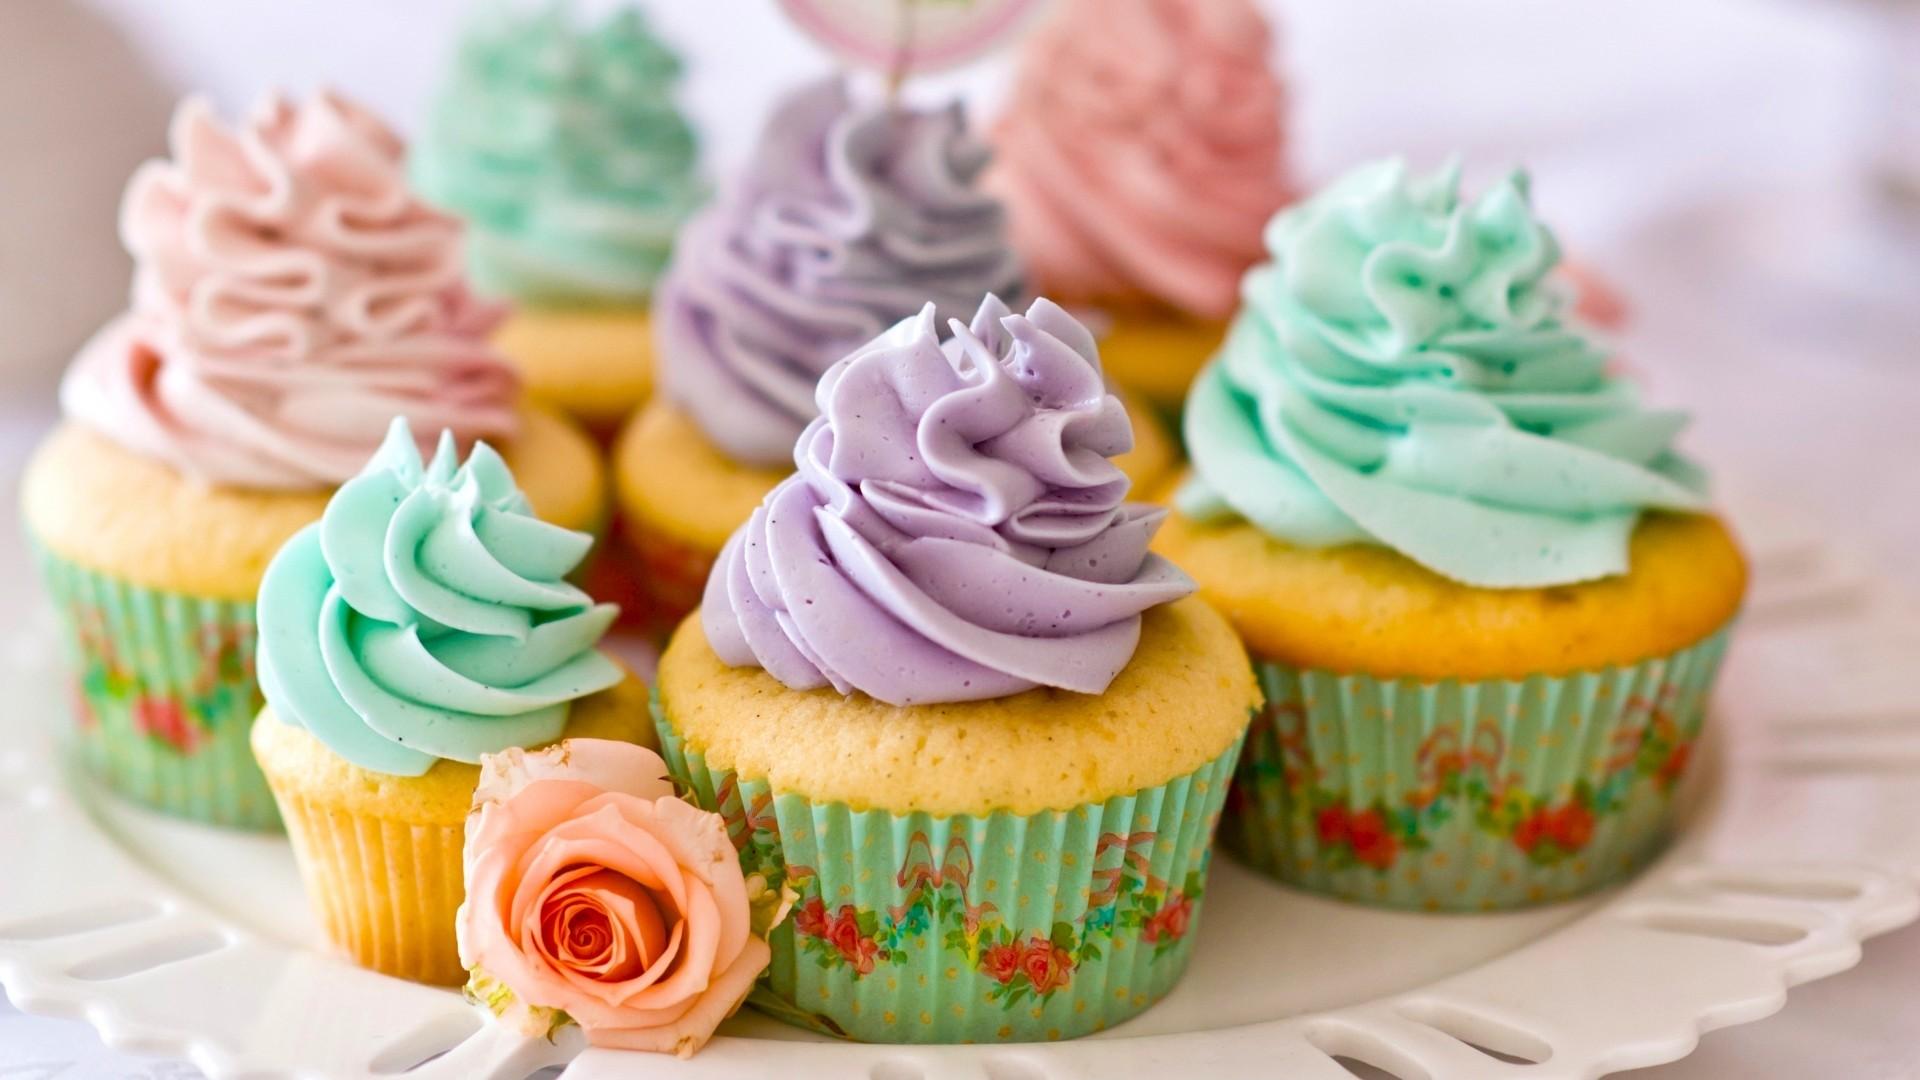 Cupcake wallpaper photo hd